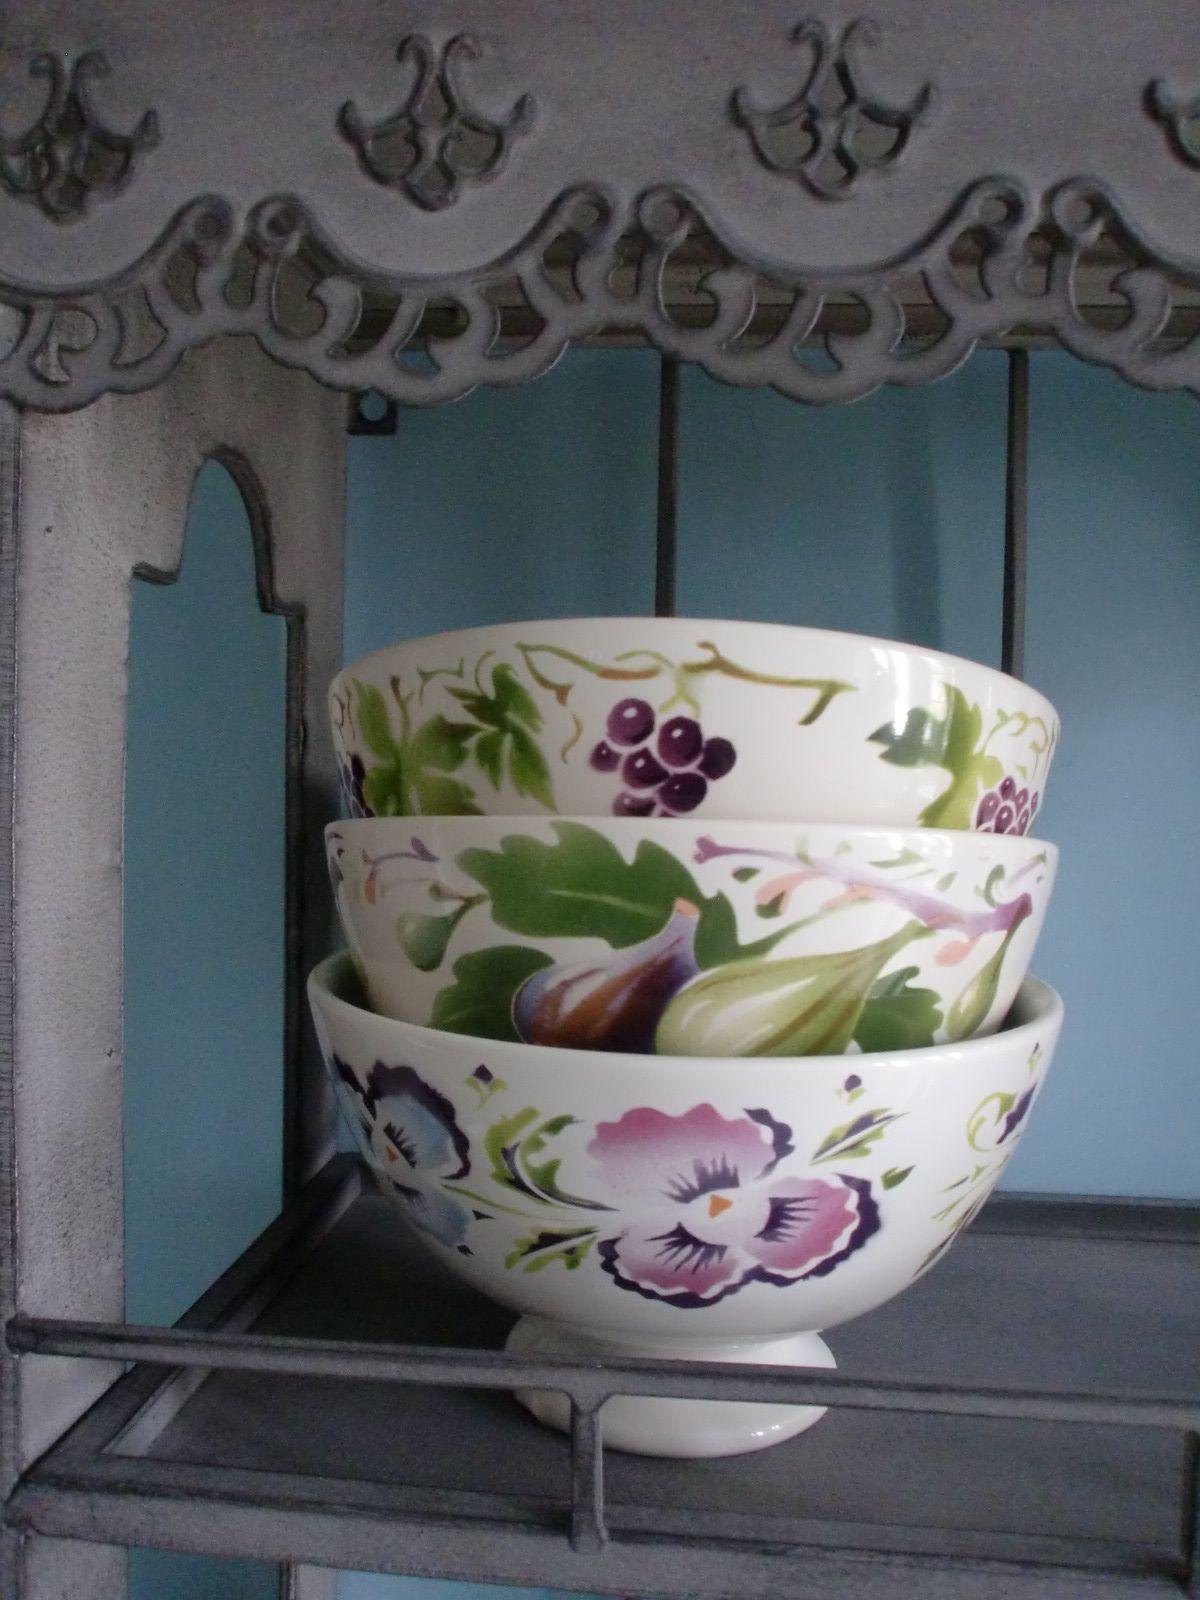 Bowls comptoir de famille comptoir de famille - Comptoir de famille online ...